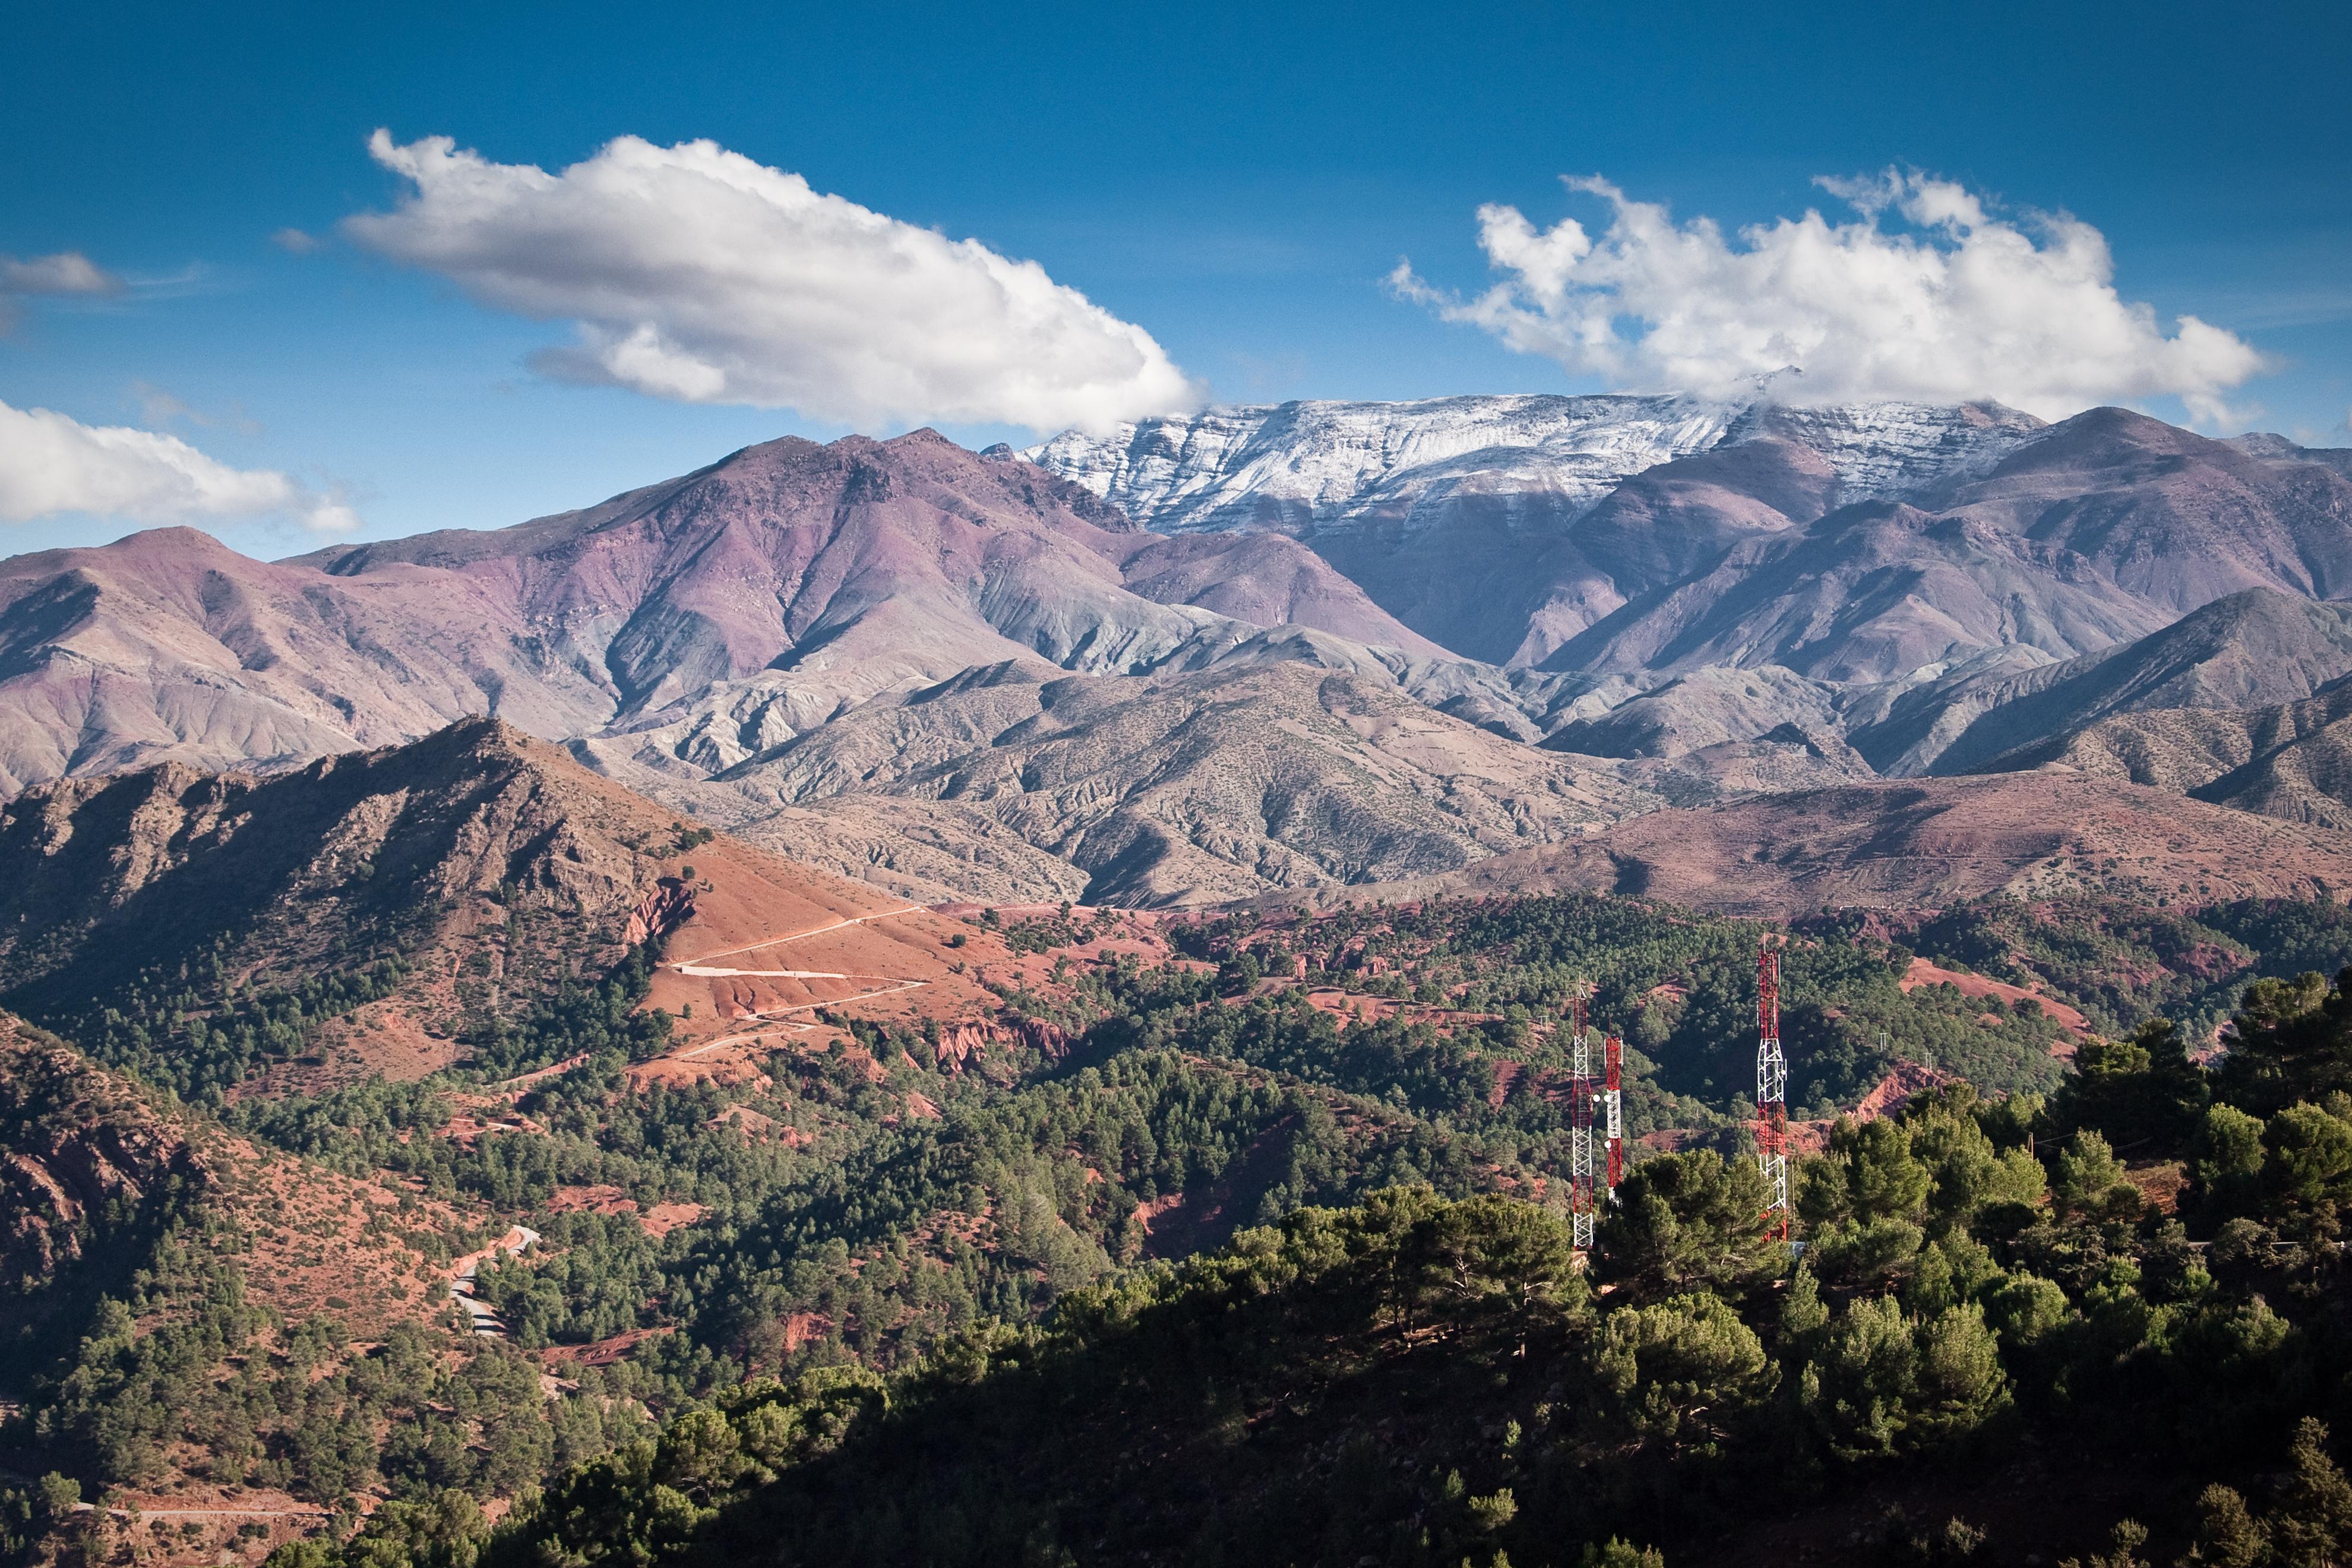 Atlas Mountains - Mountain Range in Africa - Thousand Wonders